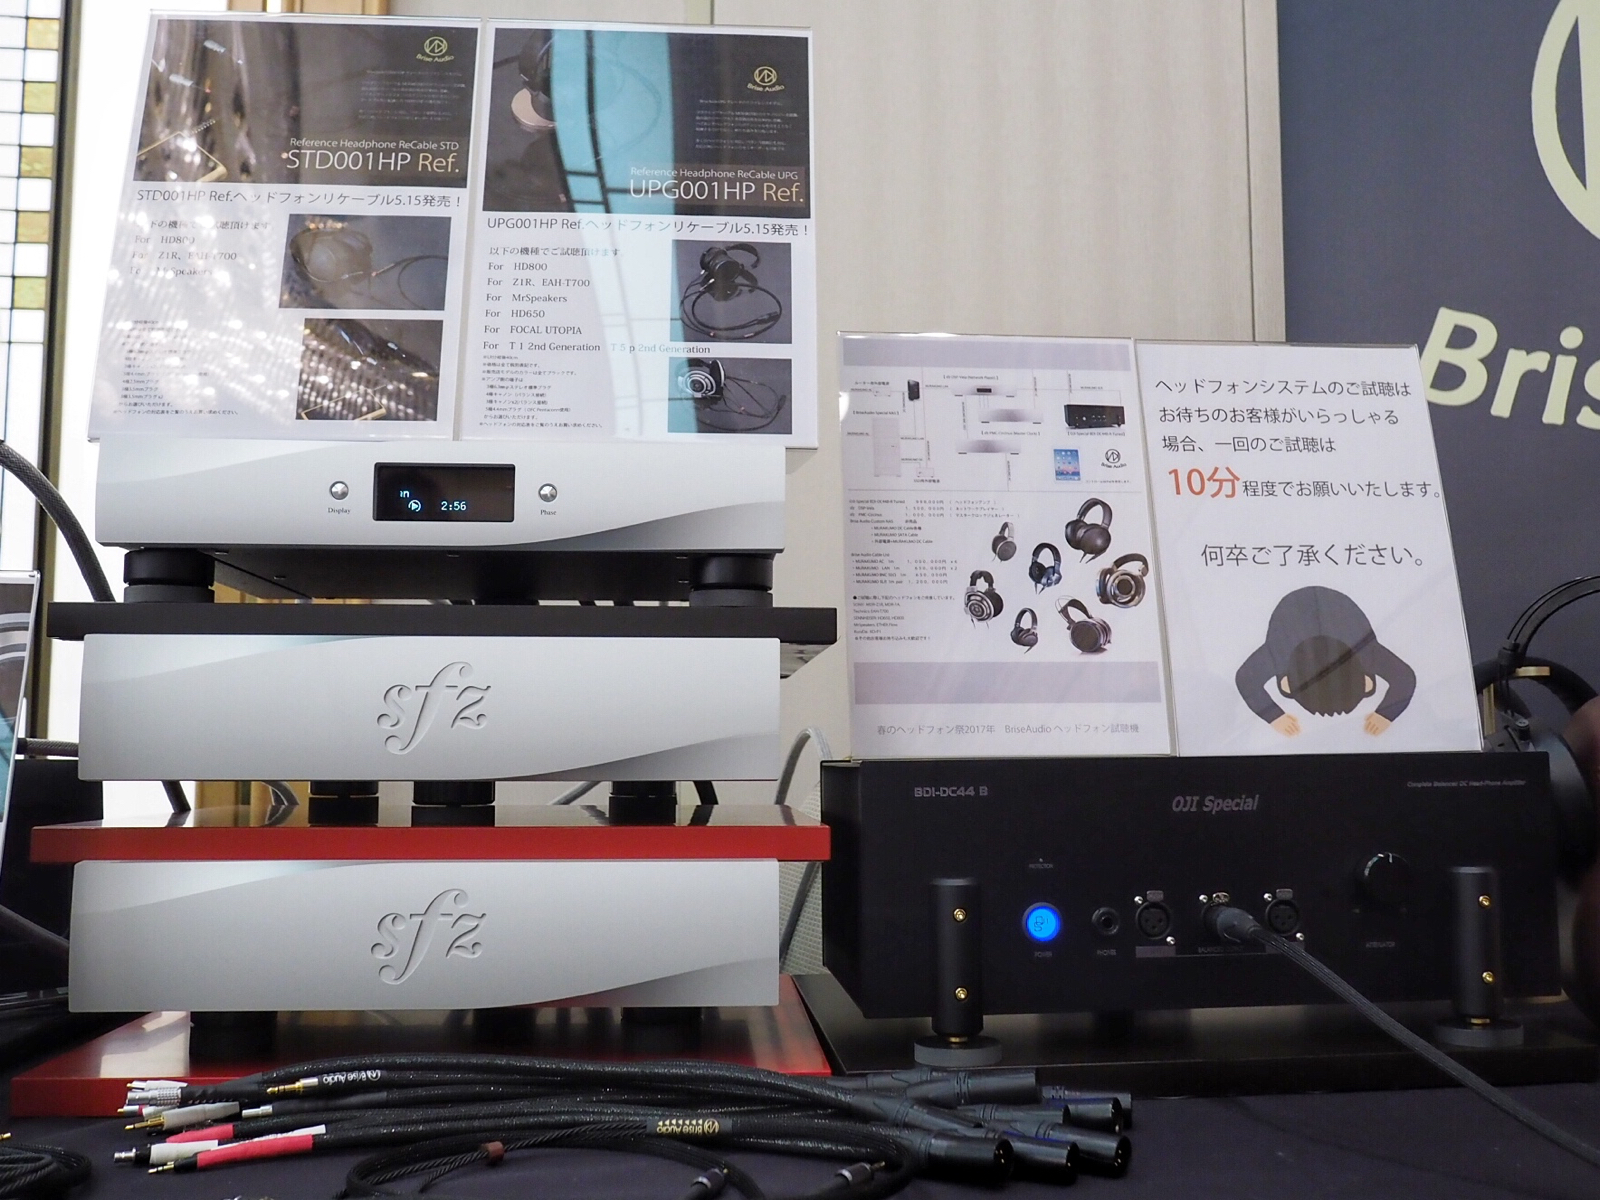 Photo 2017-04-29 11 38 33.jpg